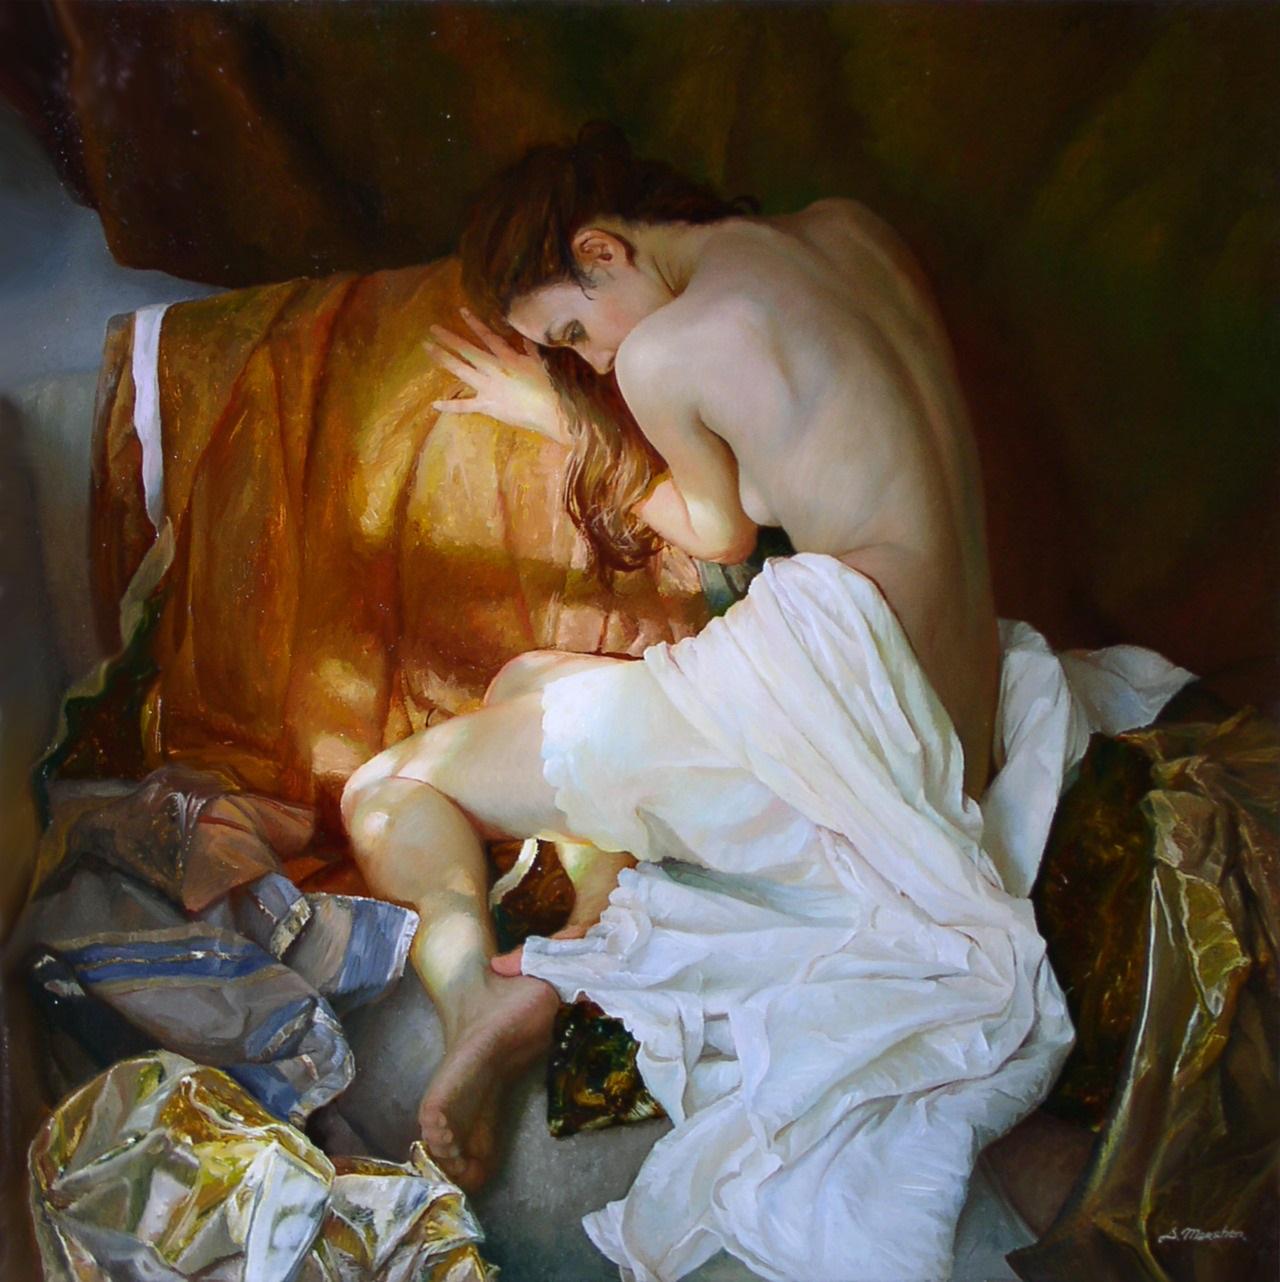 Women's images by a Russian realist artist Sergey Marshennikov - 04